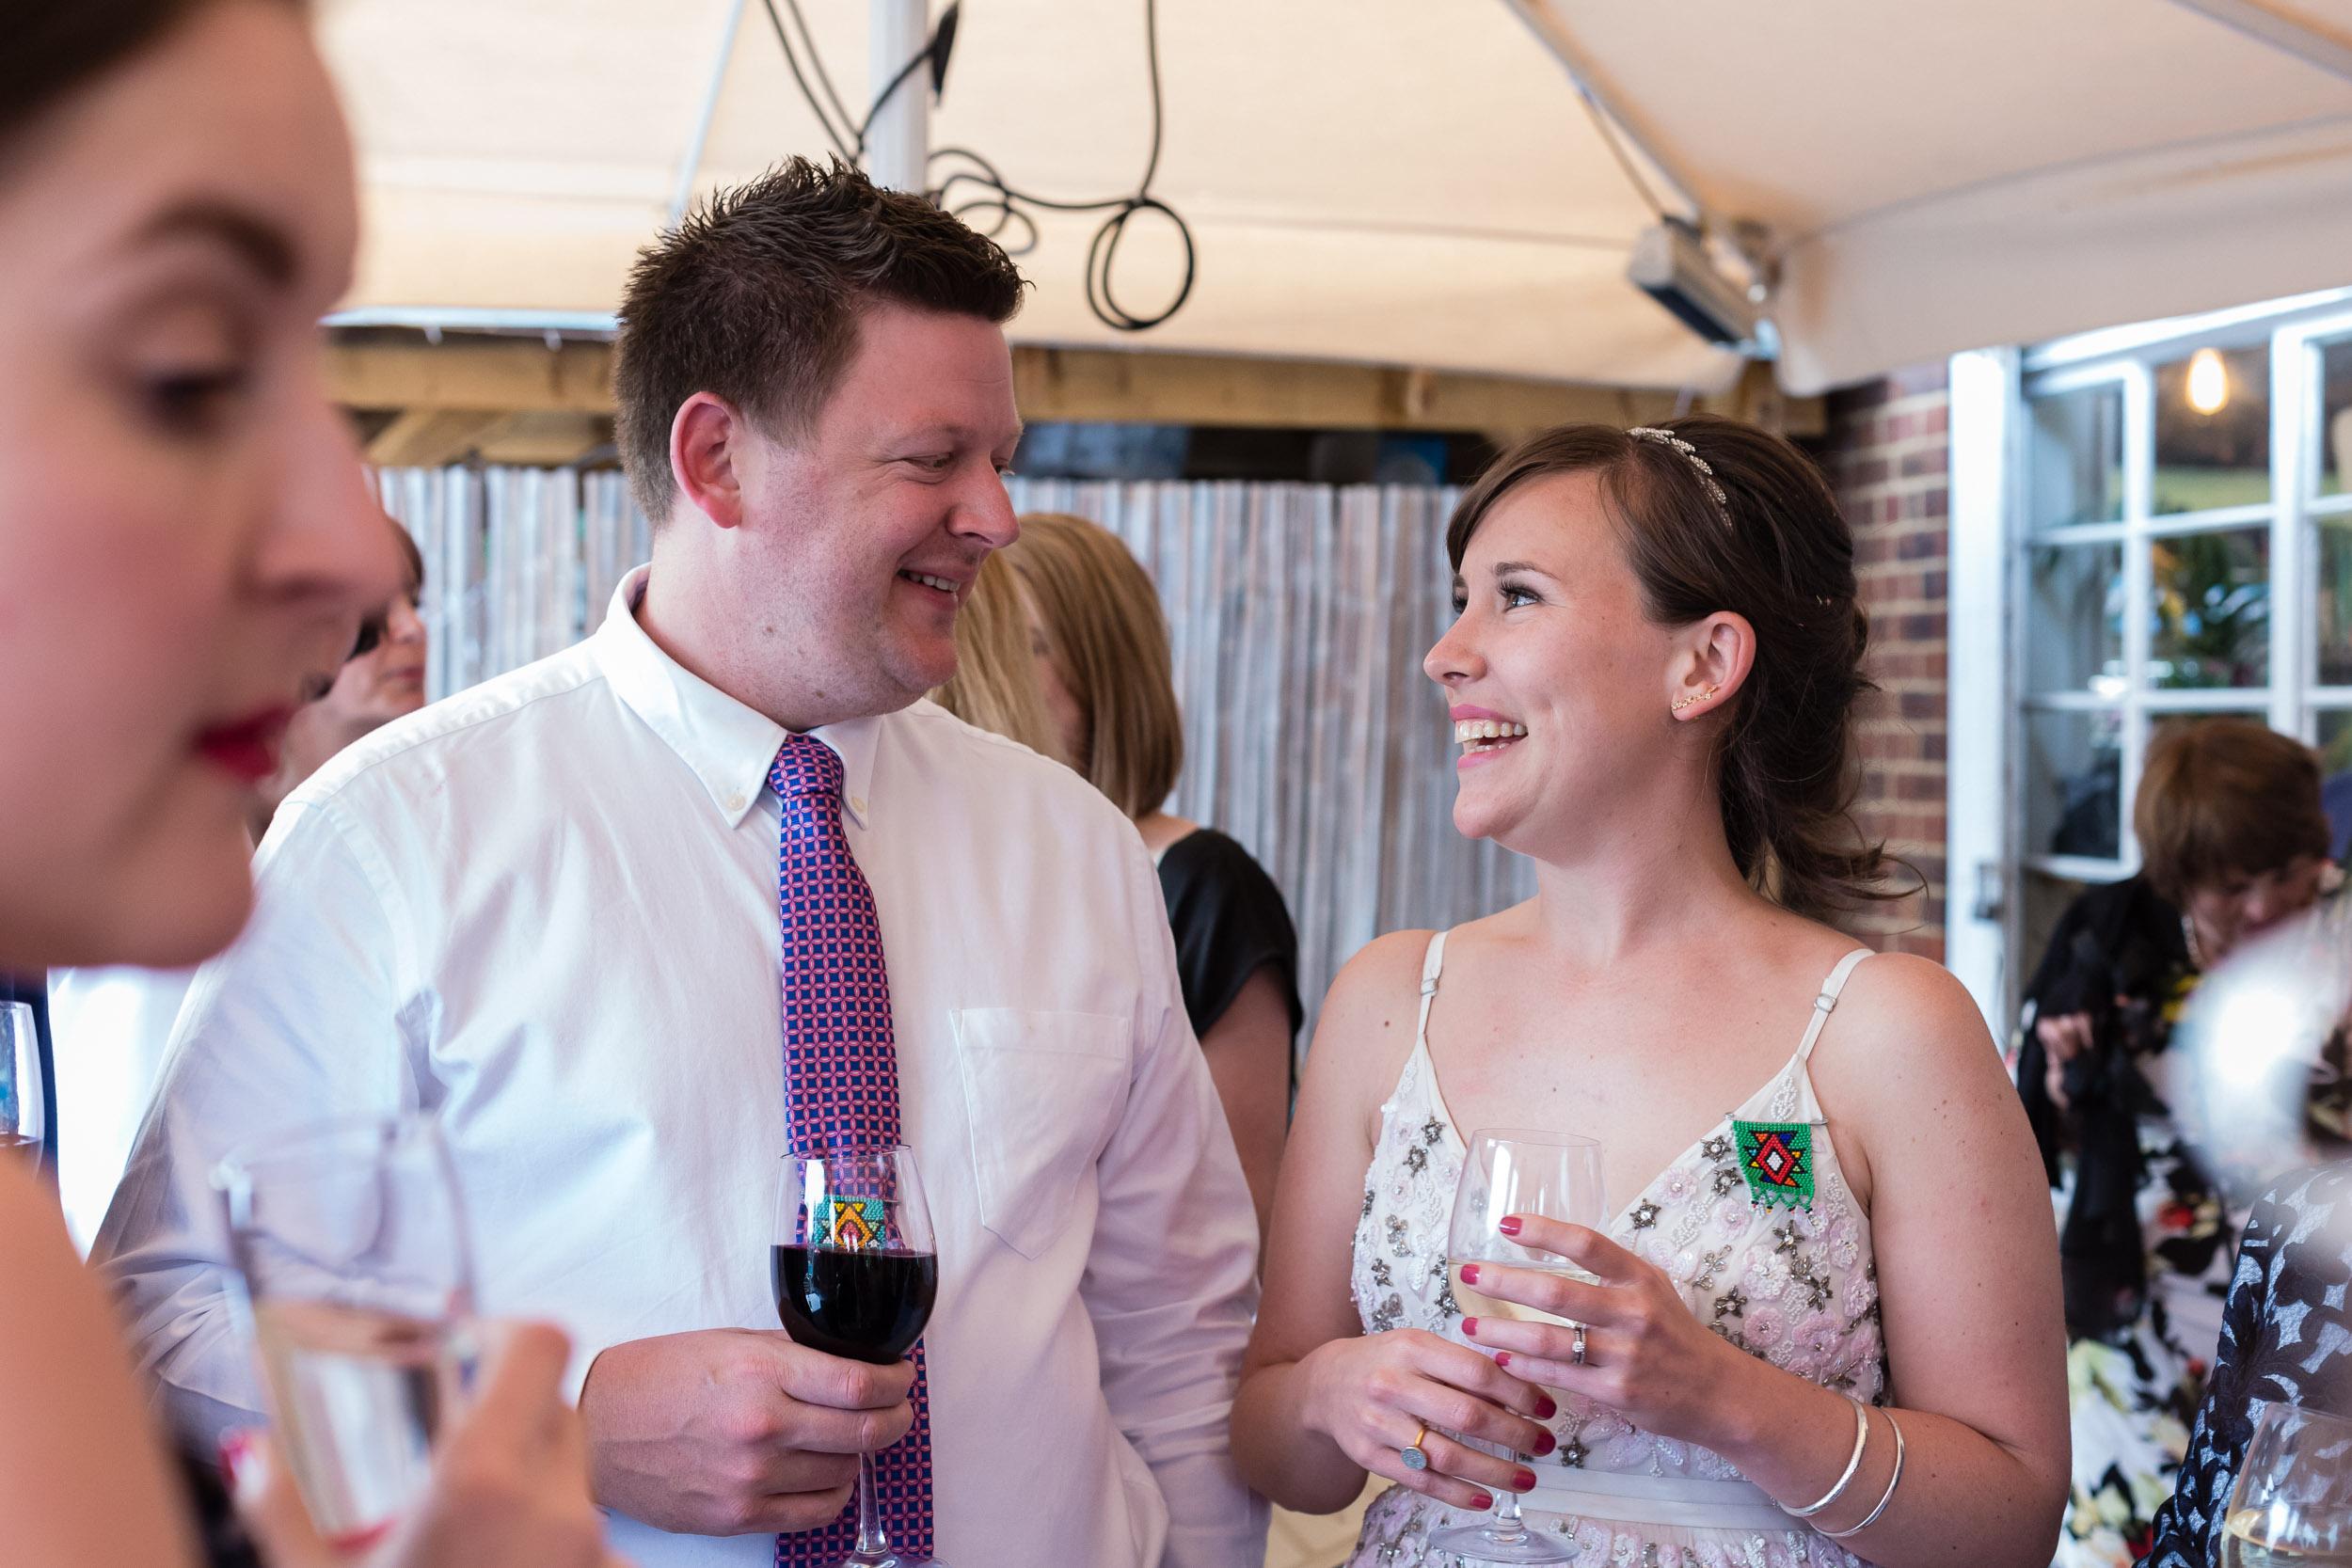 brockwell-lido-brixton-herne-hill-wedding-374.jpg